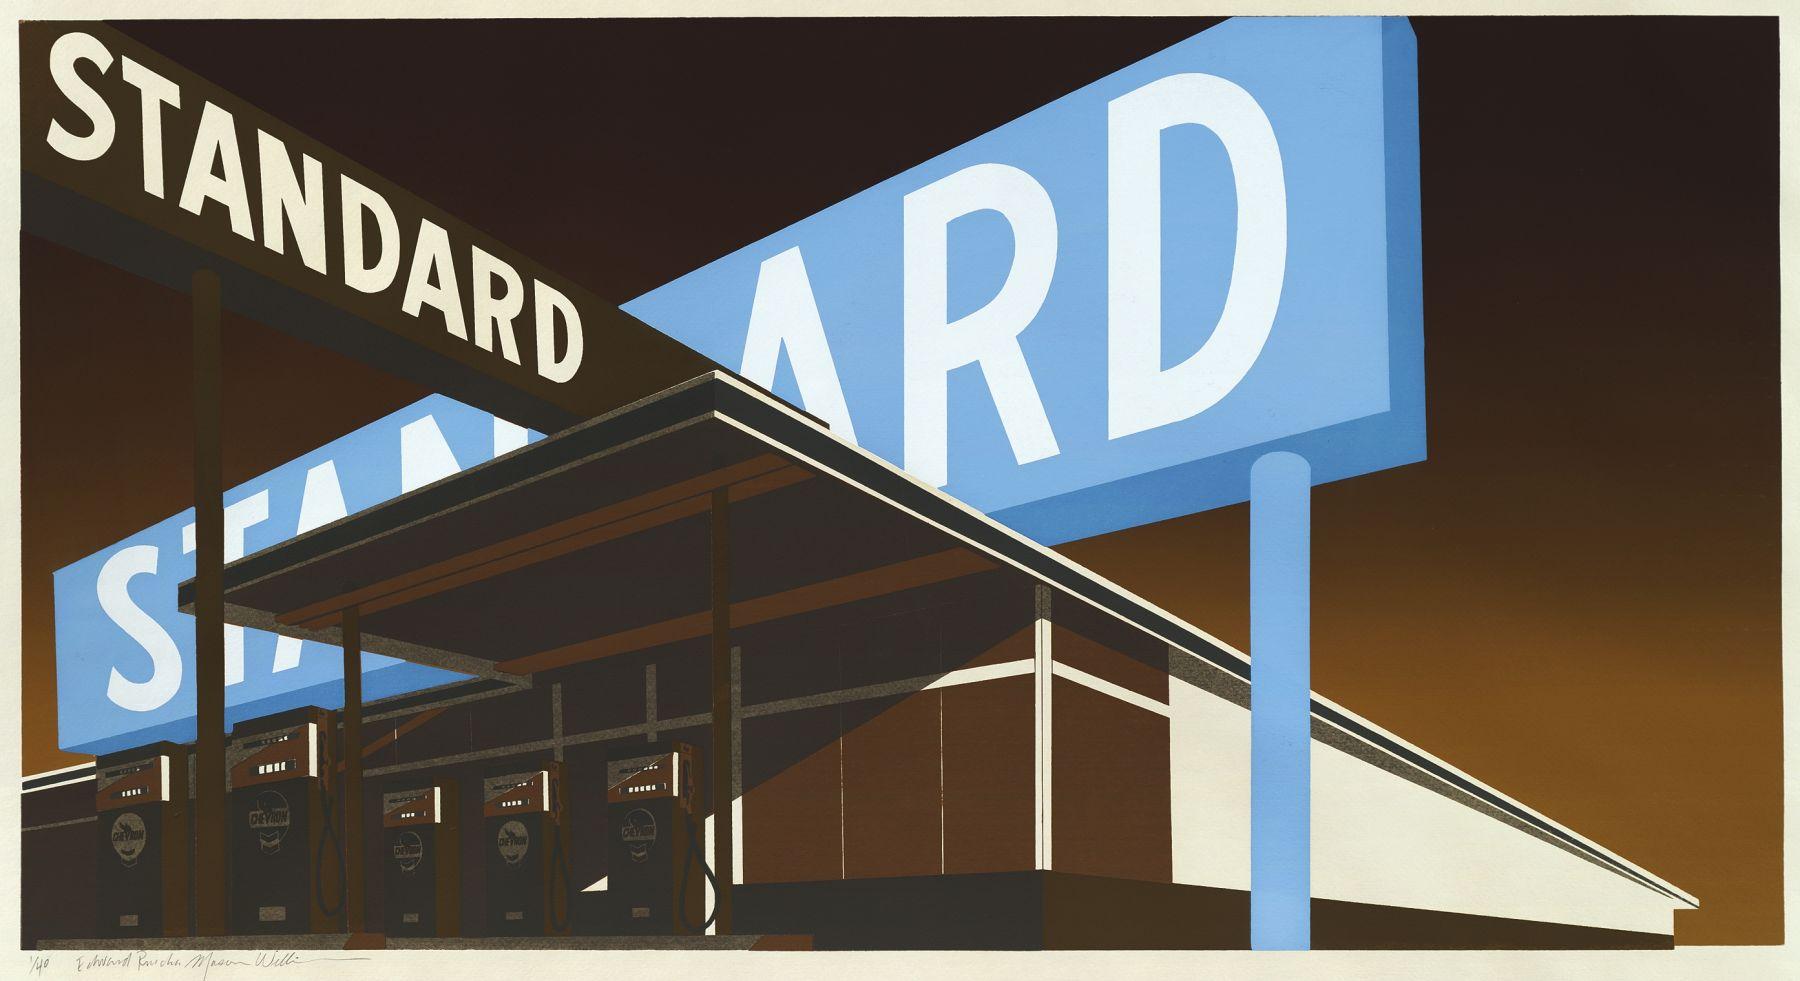 Edward Ruscha Double Standard, 1969